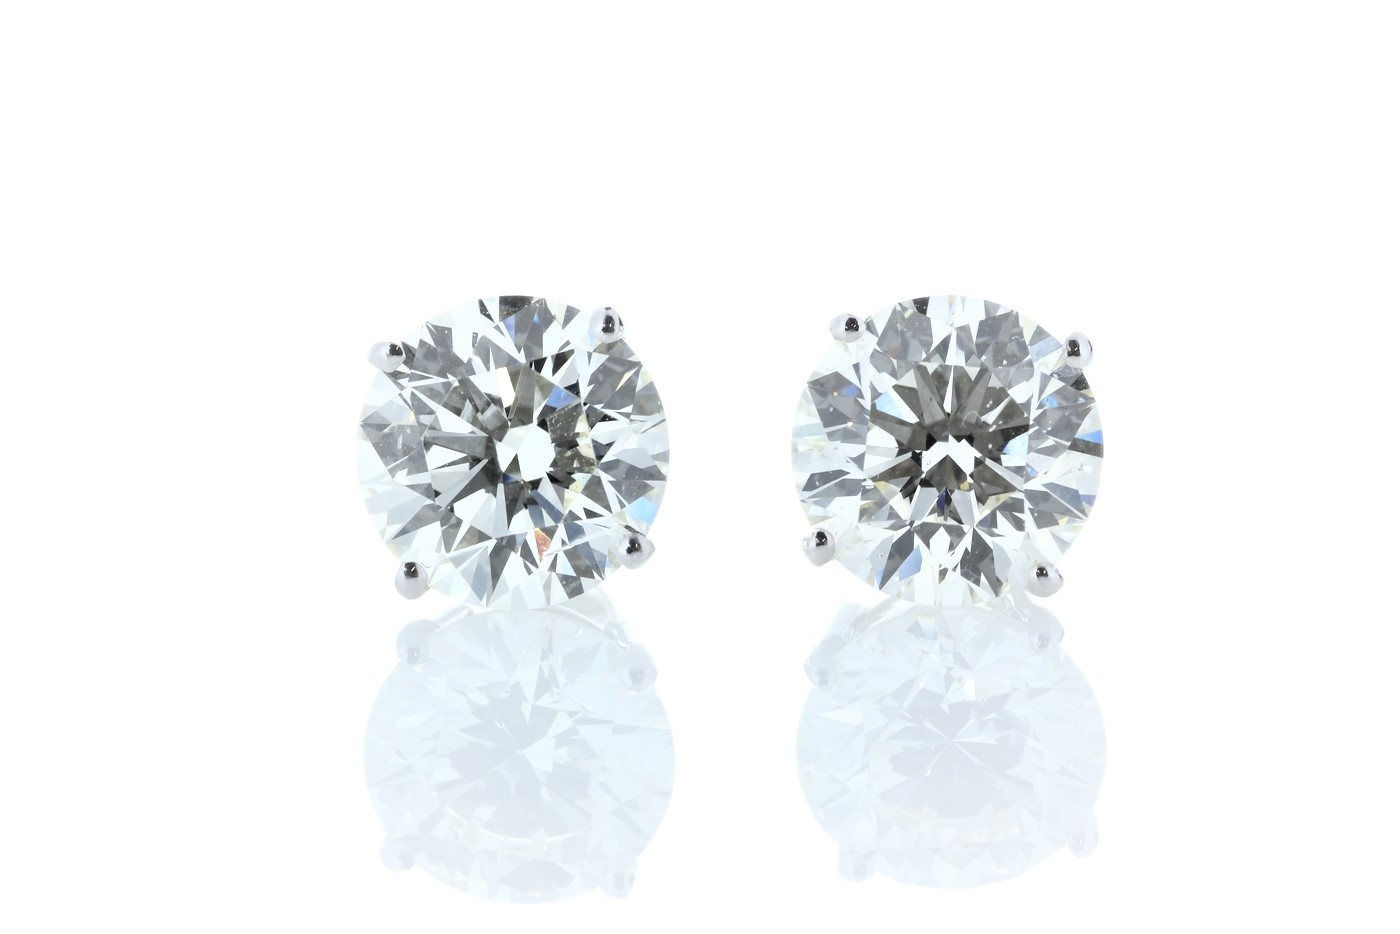 Lot 37 - 18ct White Gold Prong Set Diamond Earring 11.00 Carats